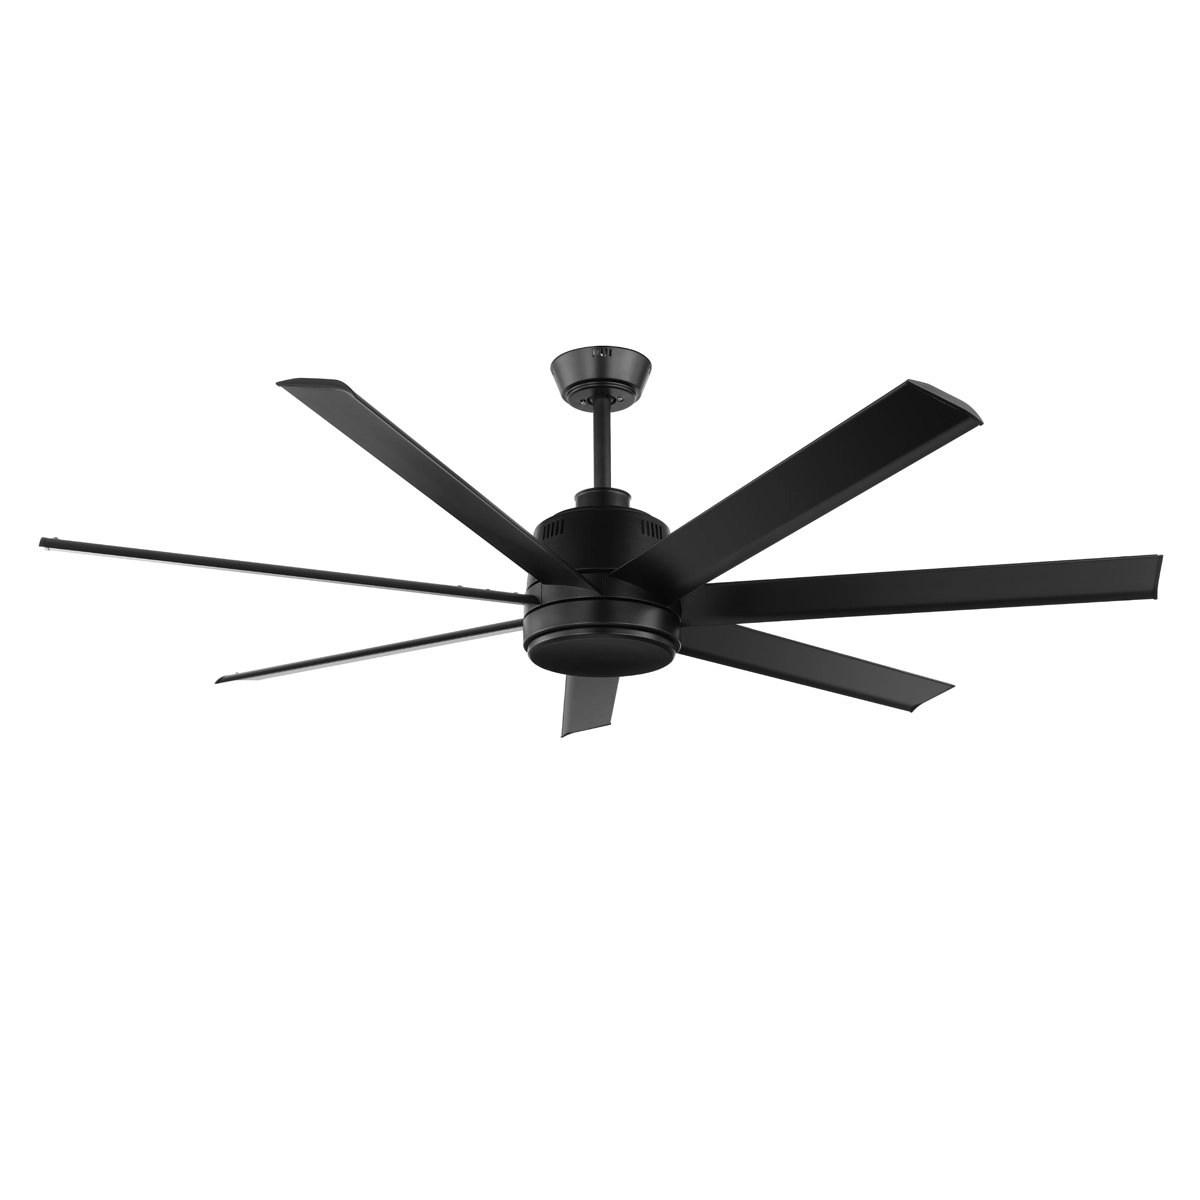 Matte Black Eglo Tourbillion 60 7 Blade Dc Indoor Outdoor Ceiling Fan With Remote Control Lighting Empire